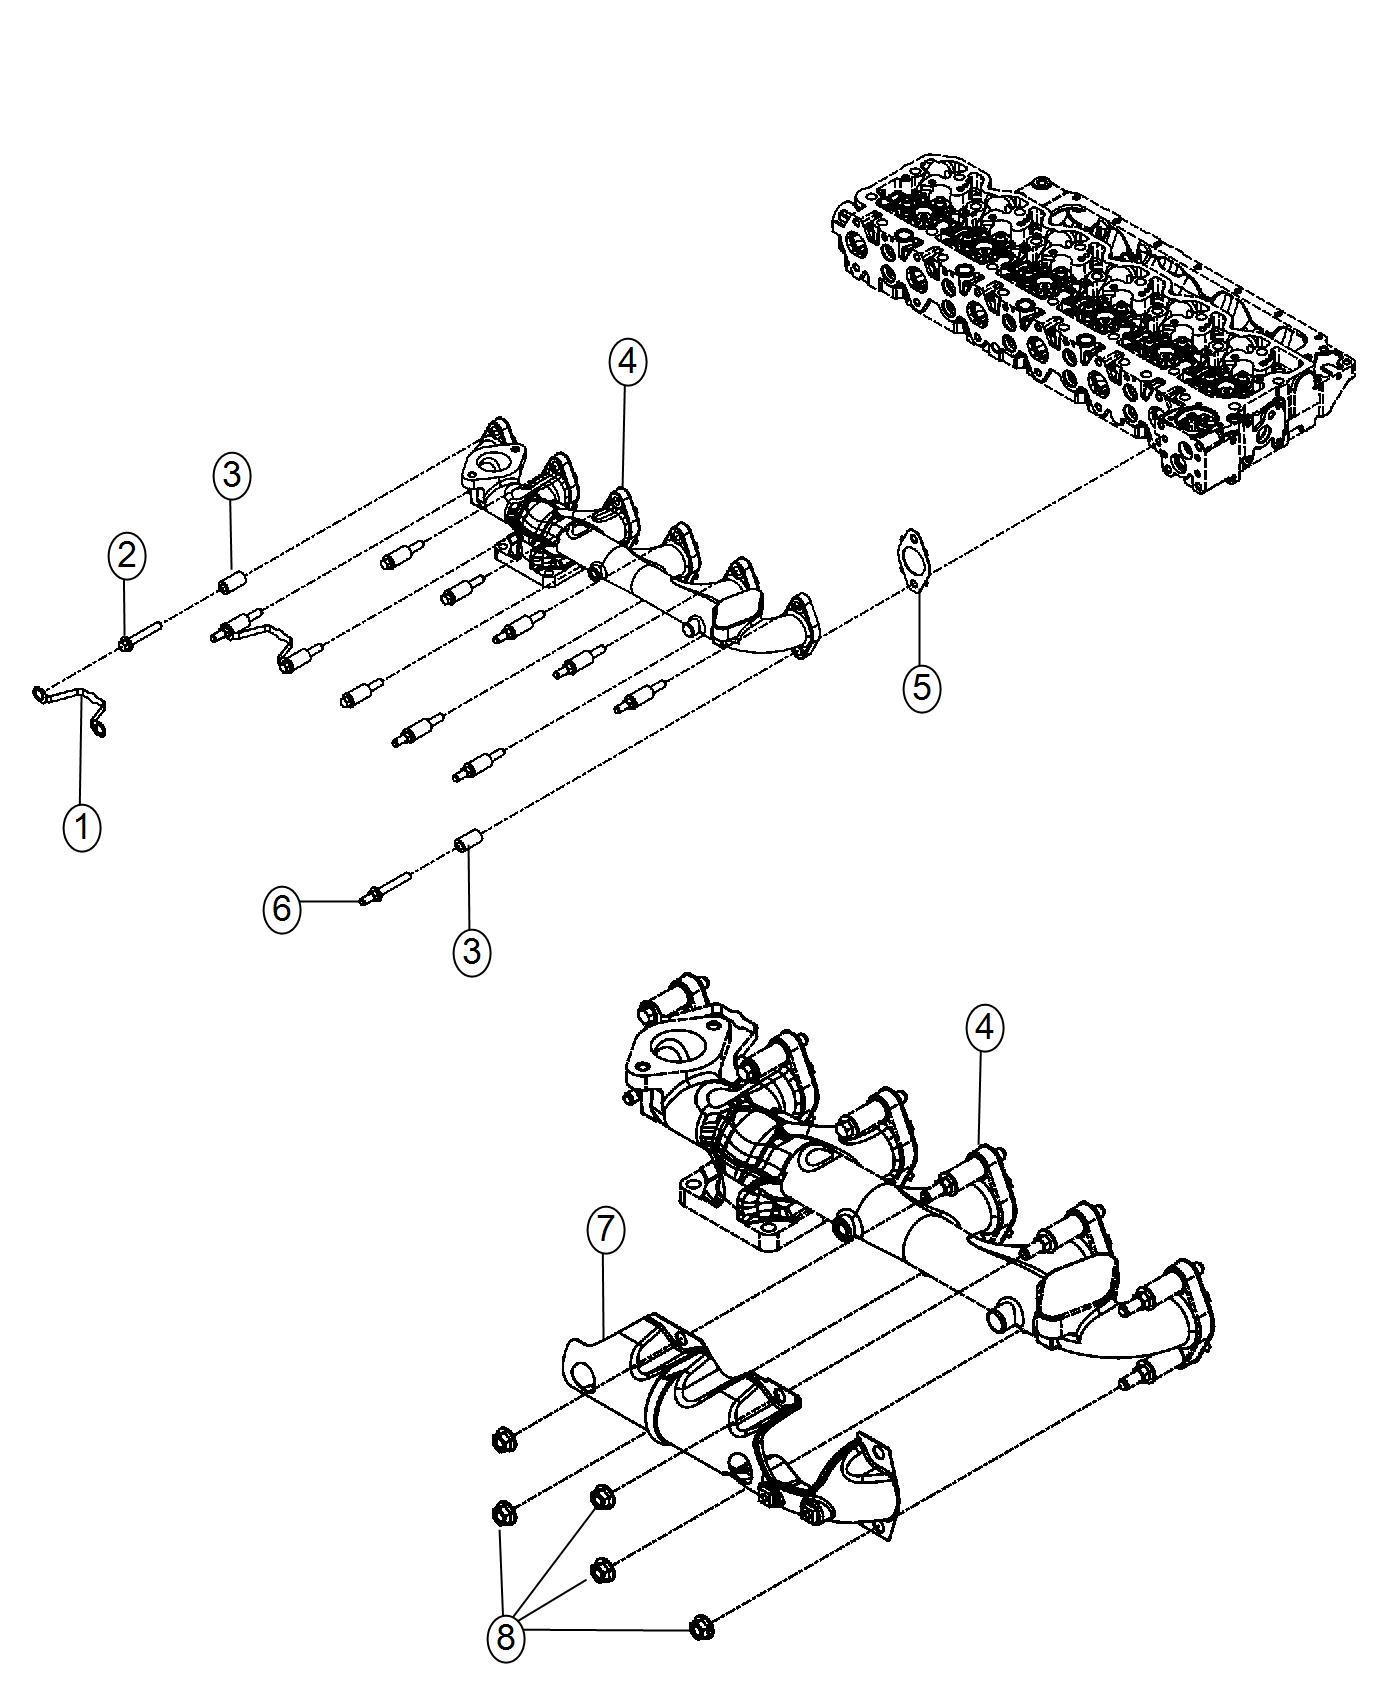 2013 Dodge Ram 4500 Manifold. Exhaust. Emissions, state